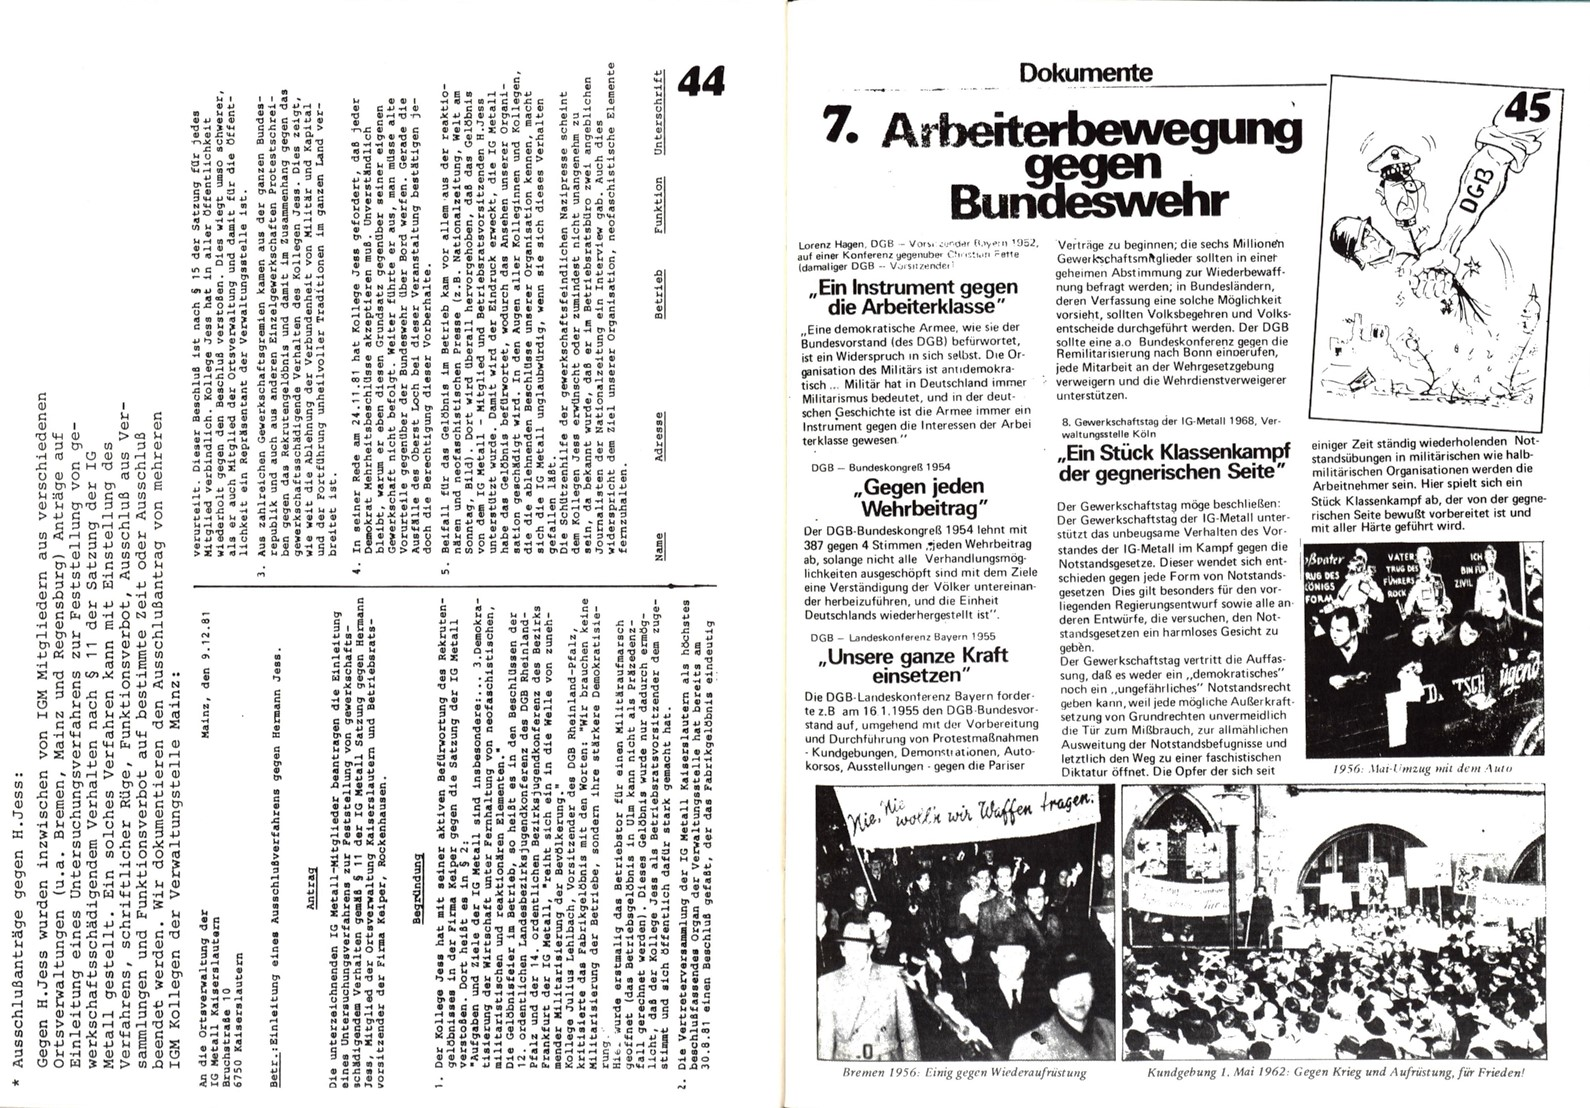 Mainz_AB_1982_Doku_Rockenhausen_24